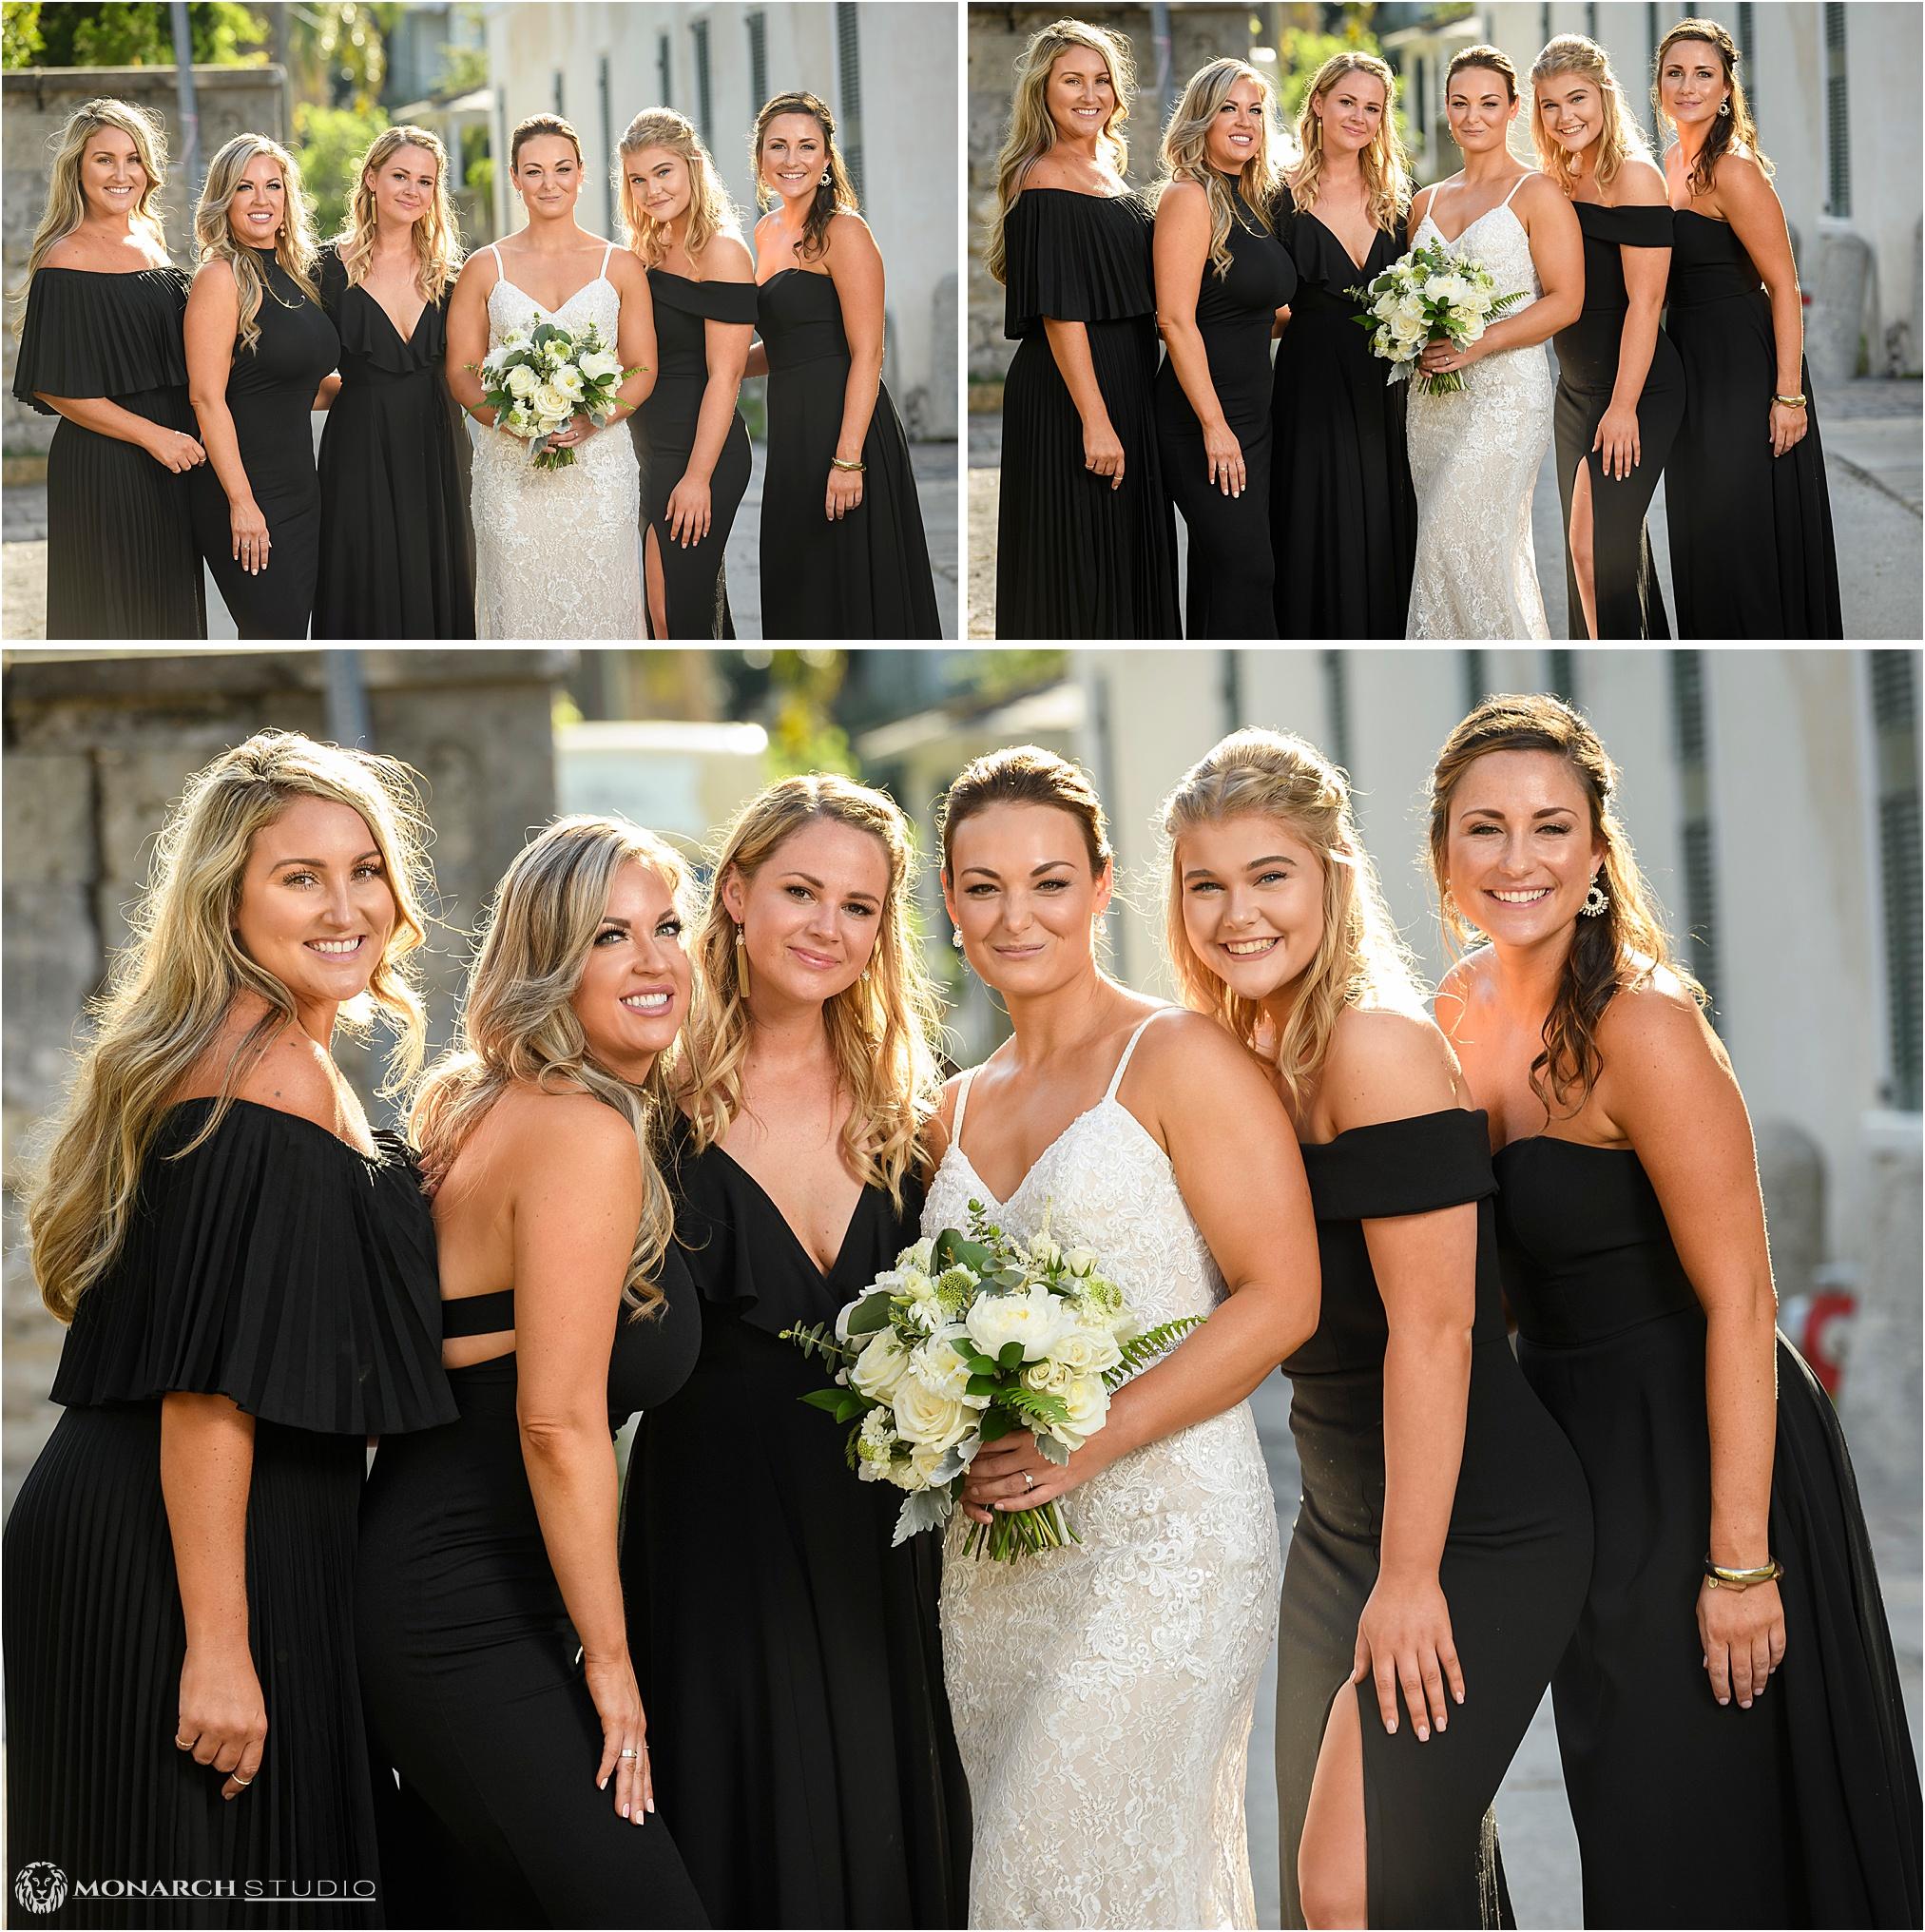 054-whiteroom-wedding-photographer-2019-05-22_0036.jpg